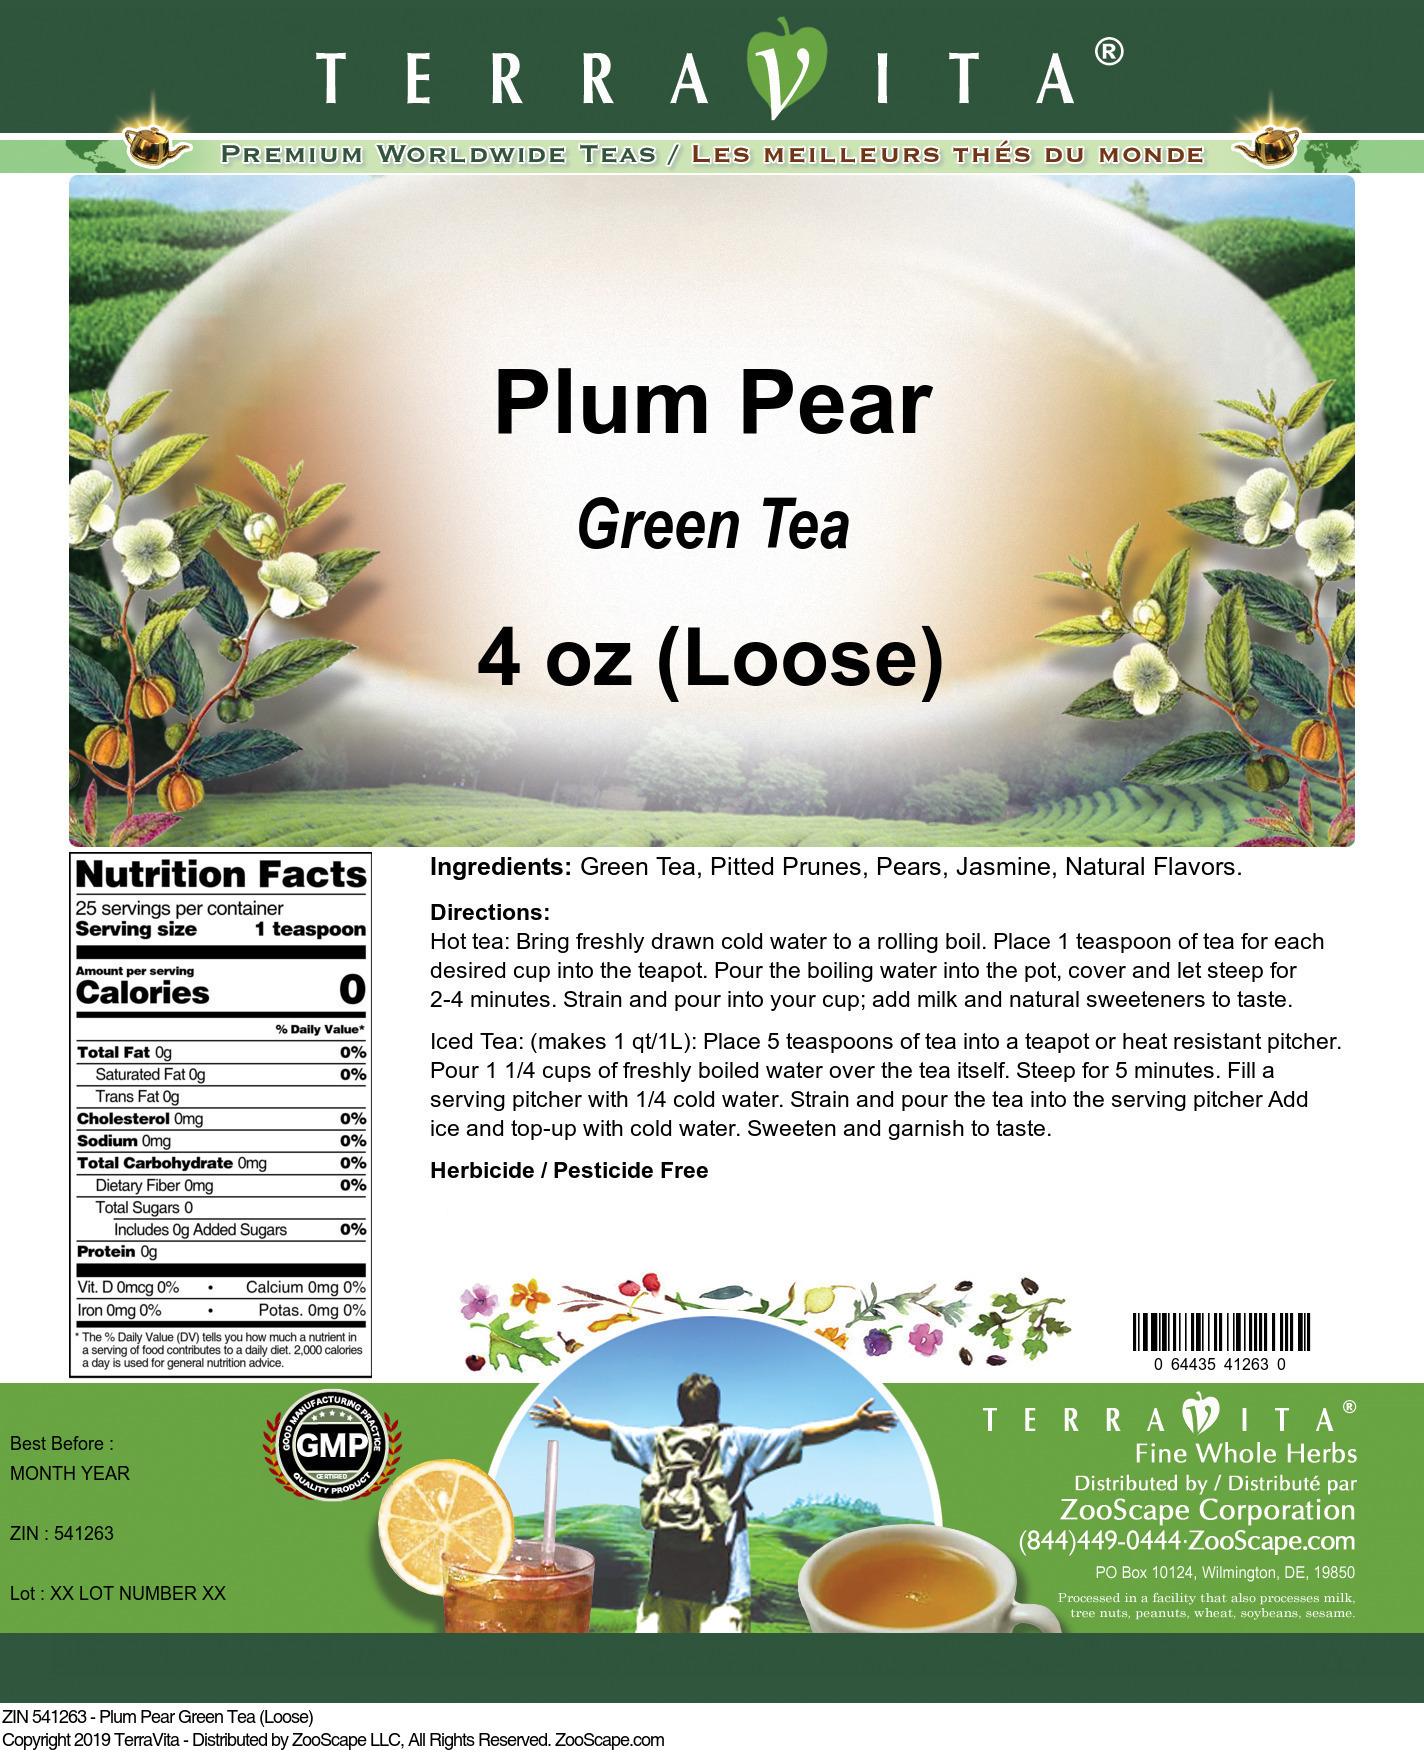 Plum Pear Green Tea (Loose)